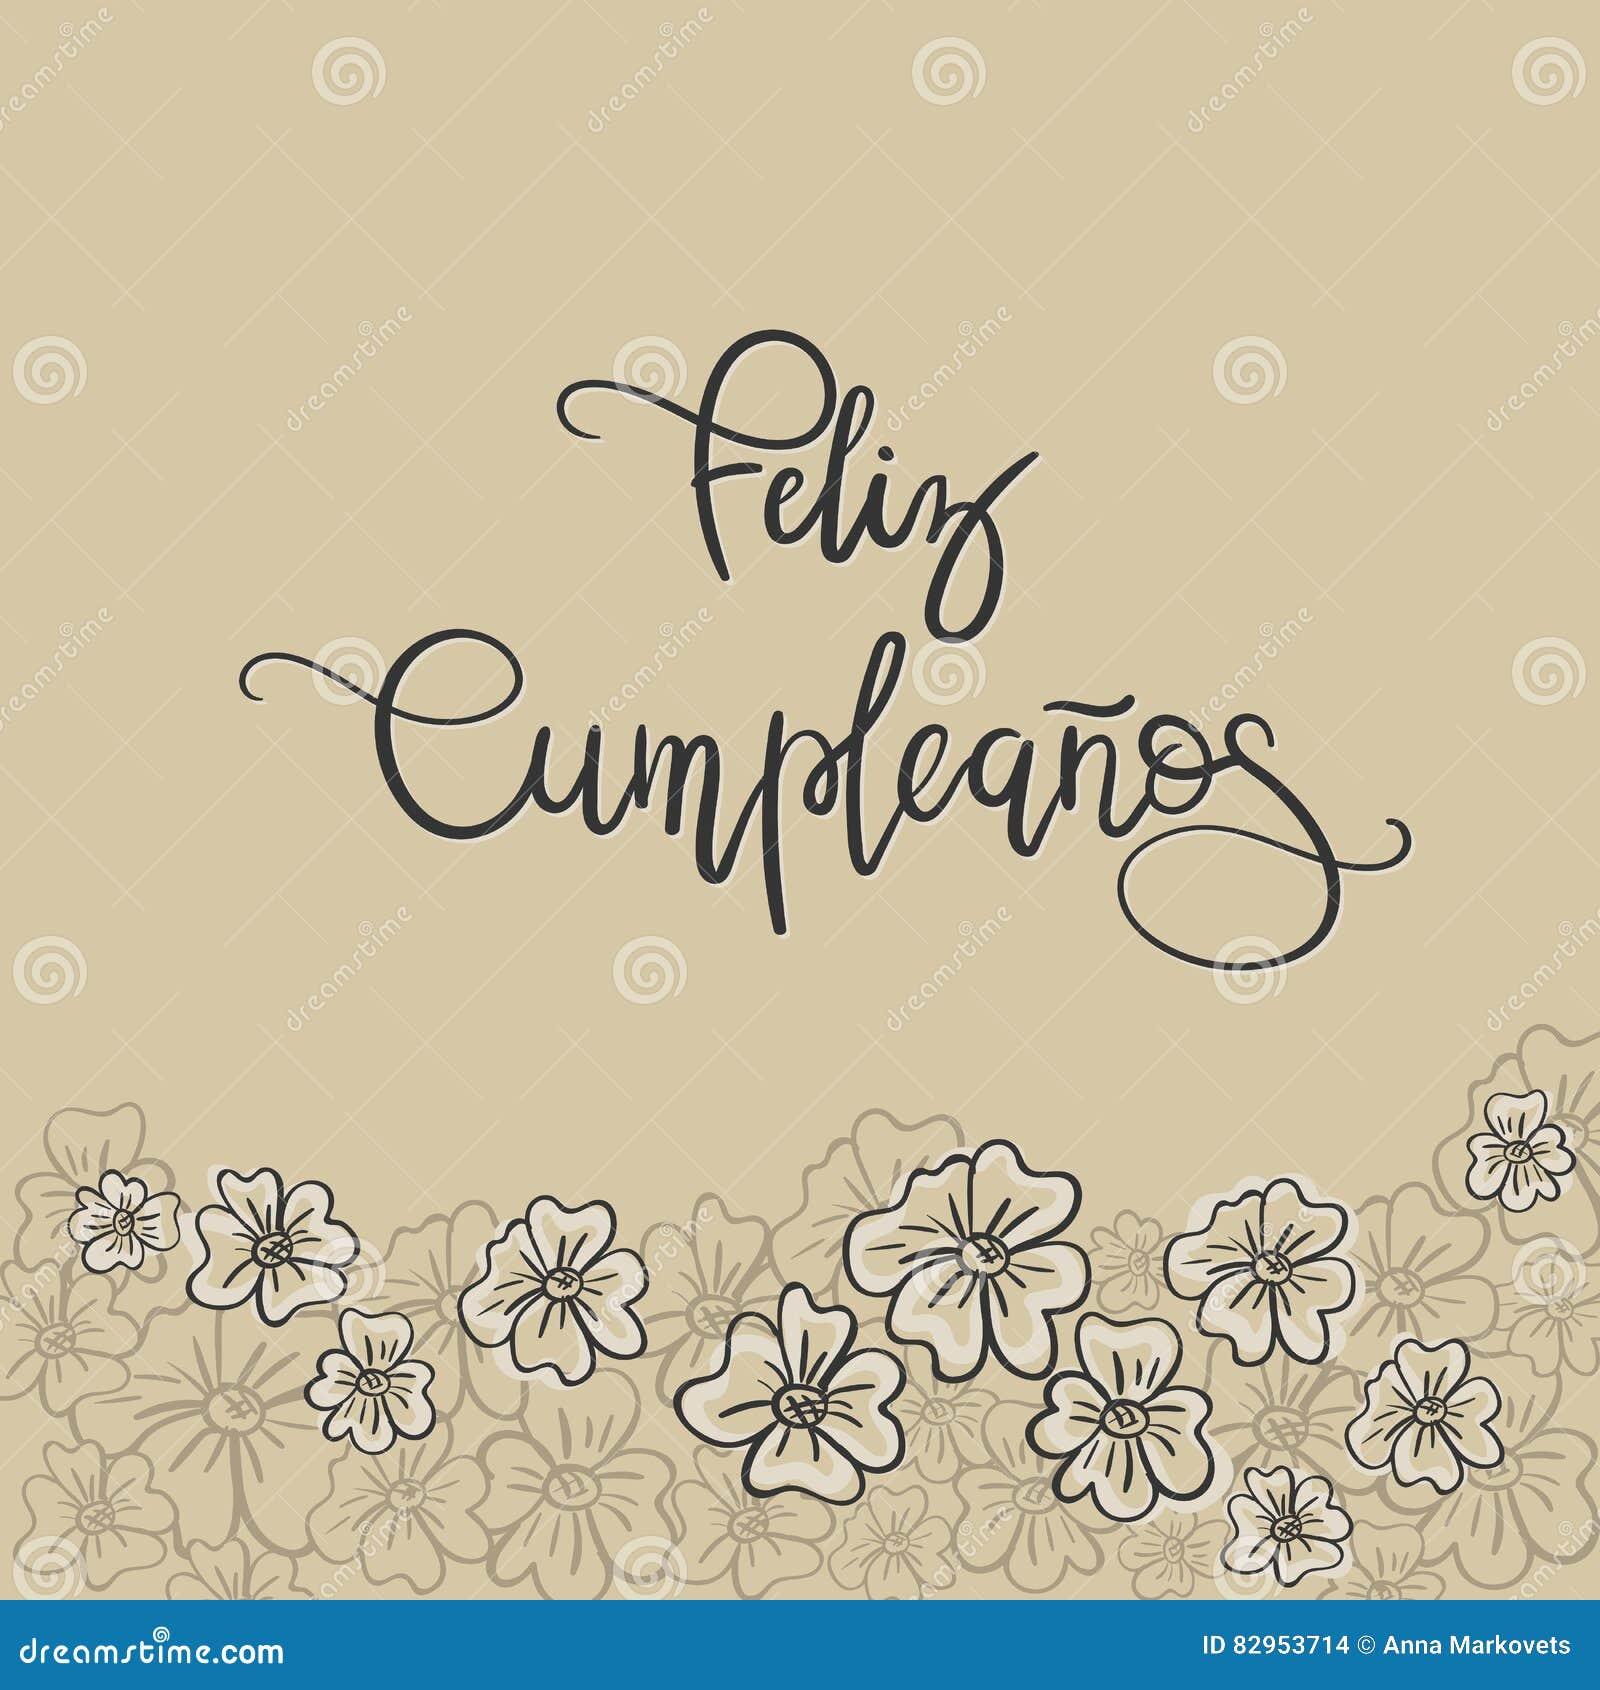 Feliz Cumpleanos Happy Birthday Spanish Text Greeting Card Modern Calligraphy Vector Illustration